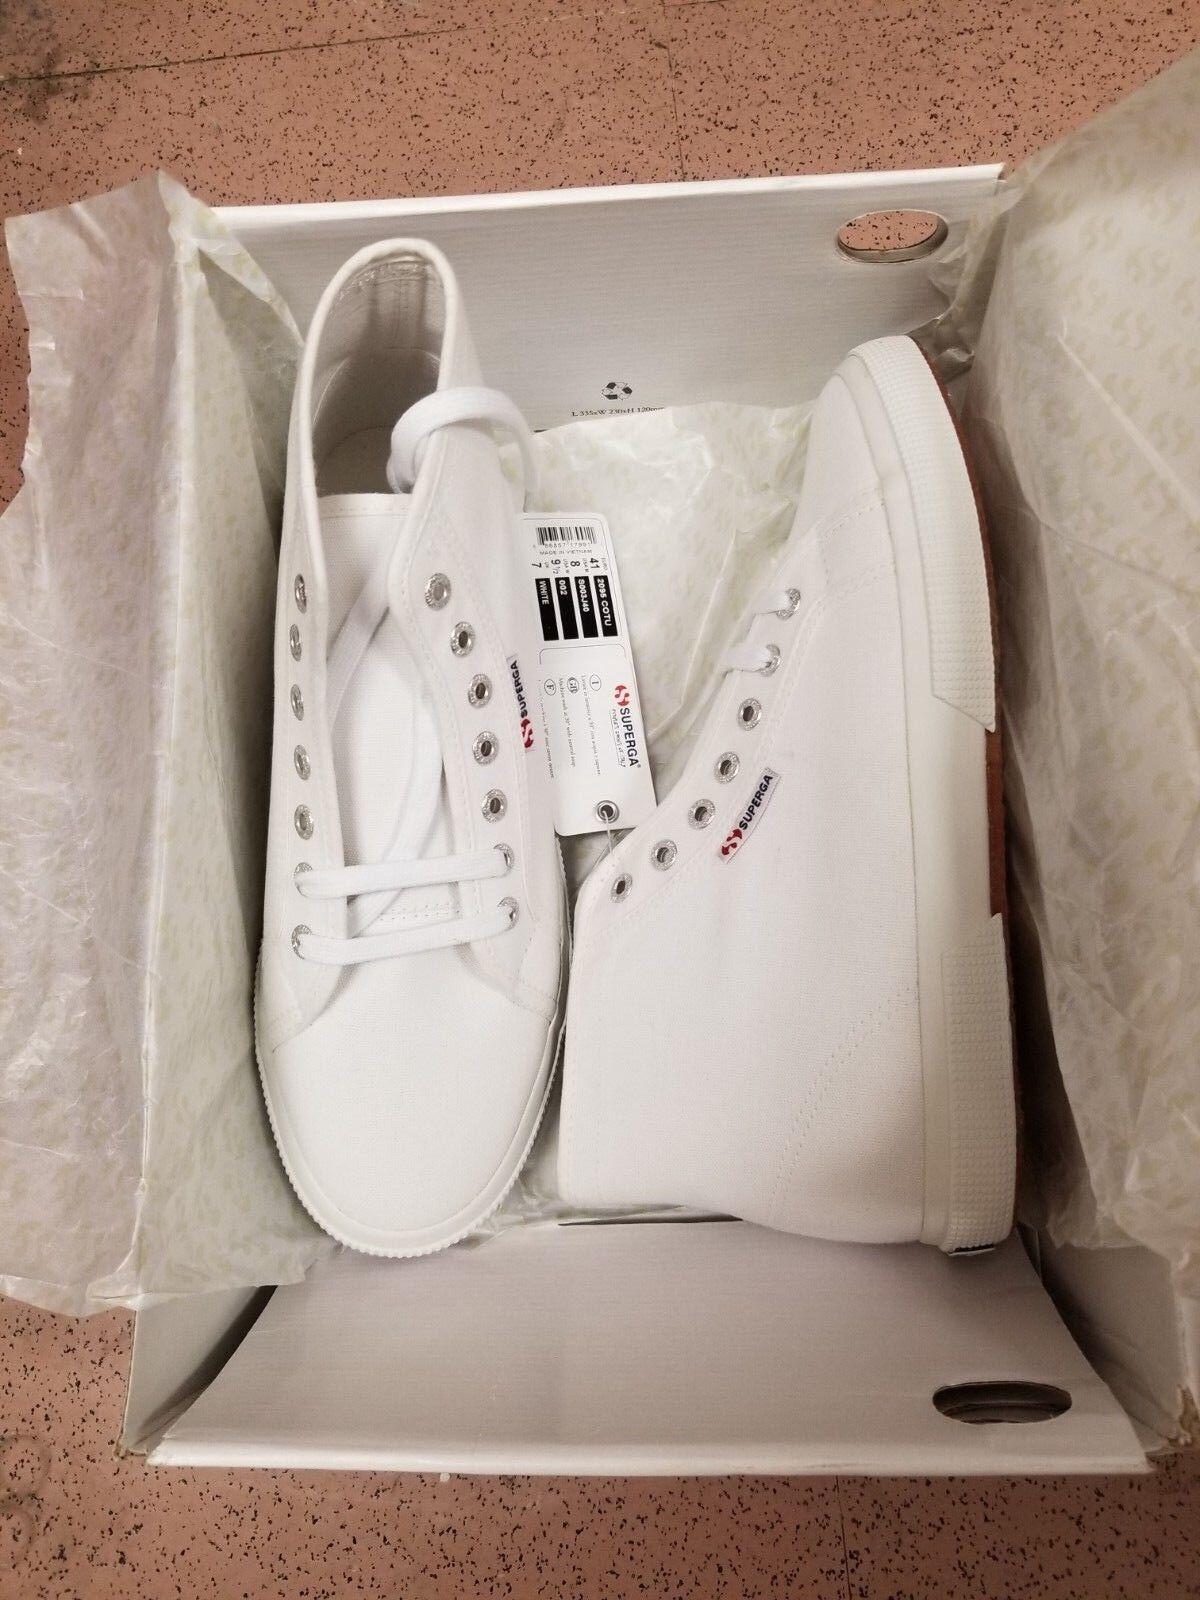 NEW SUPERGA COTU 2095 Sneaker - White, Size 8M 9 1 2W